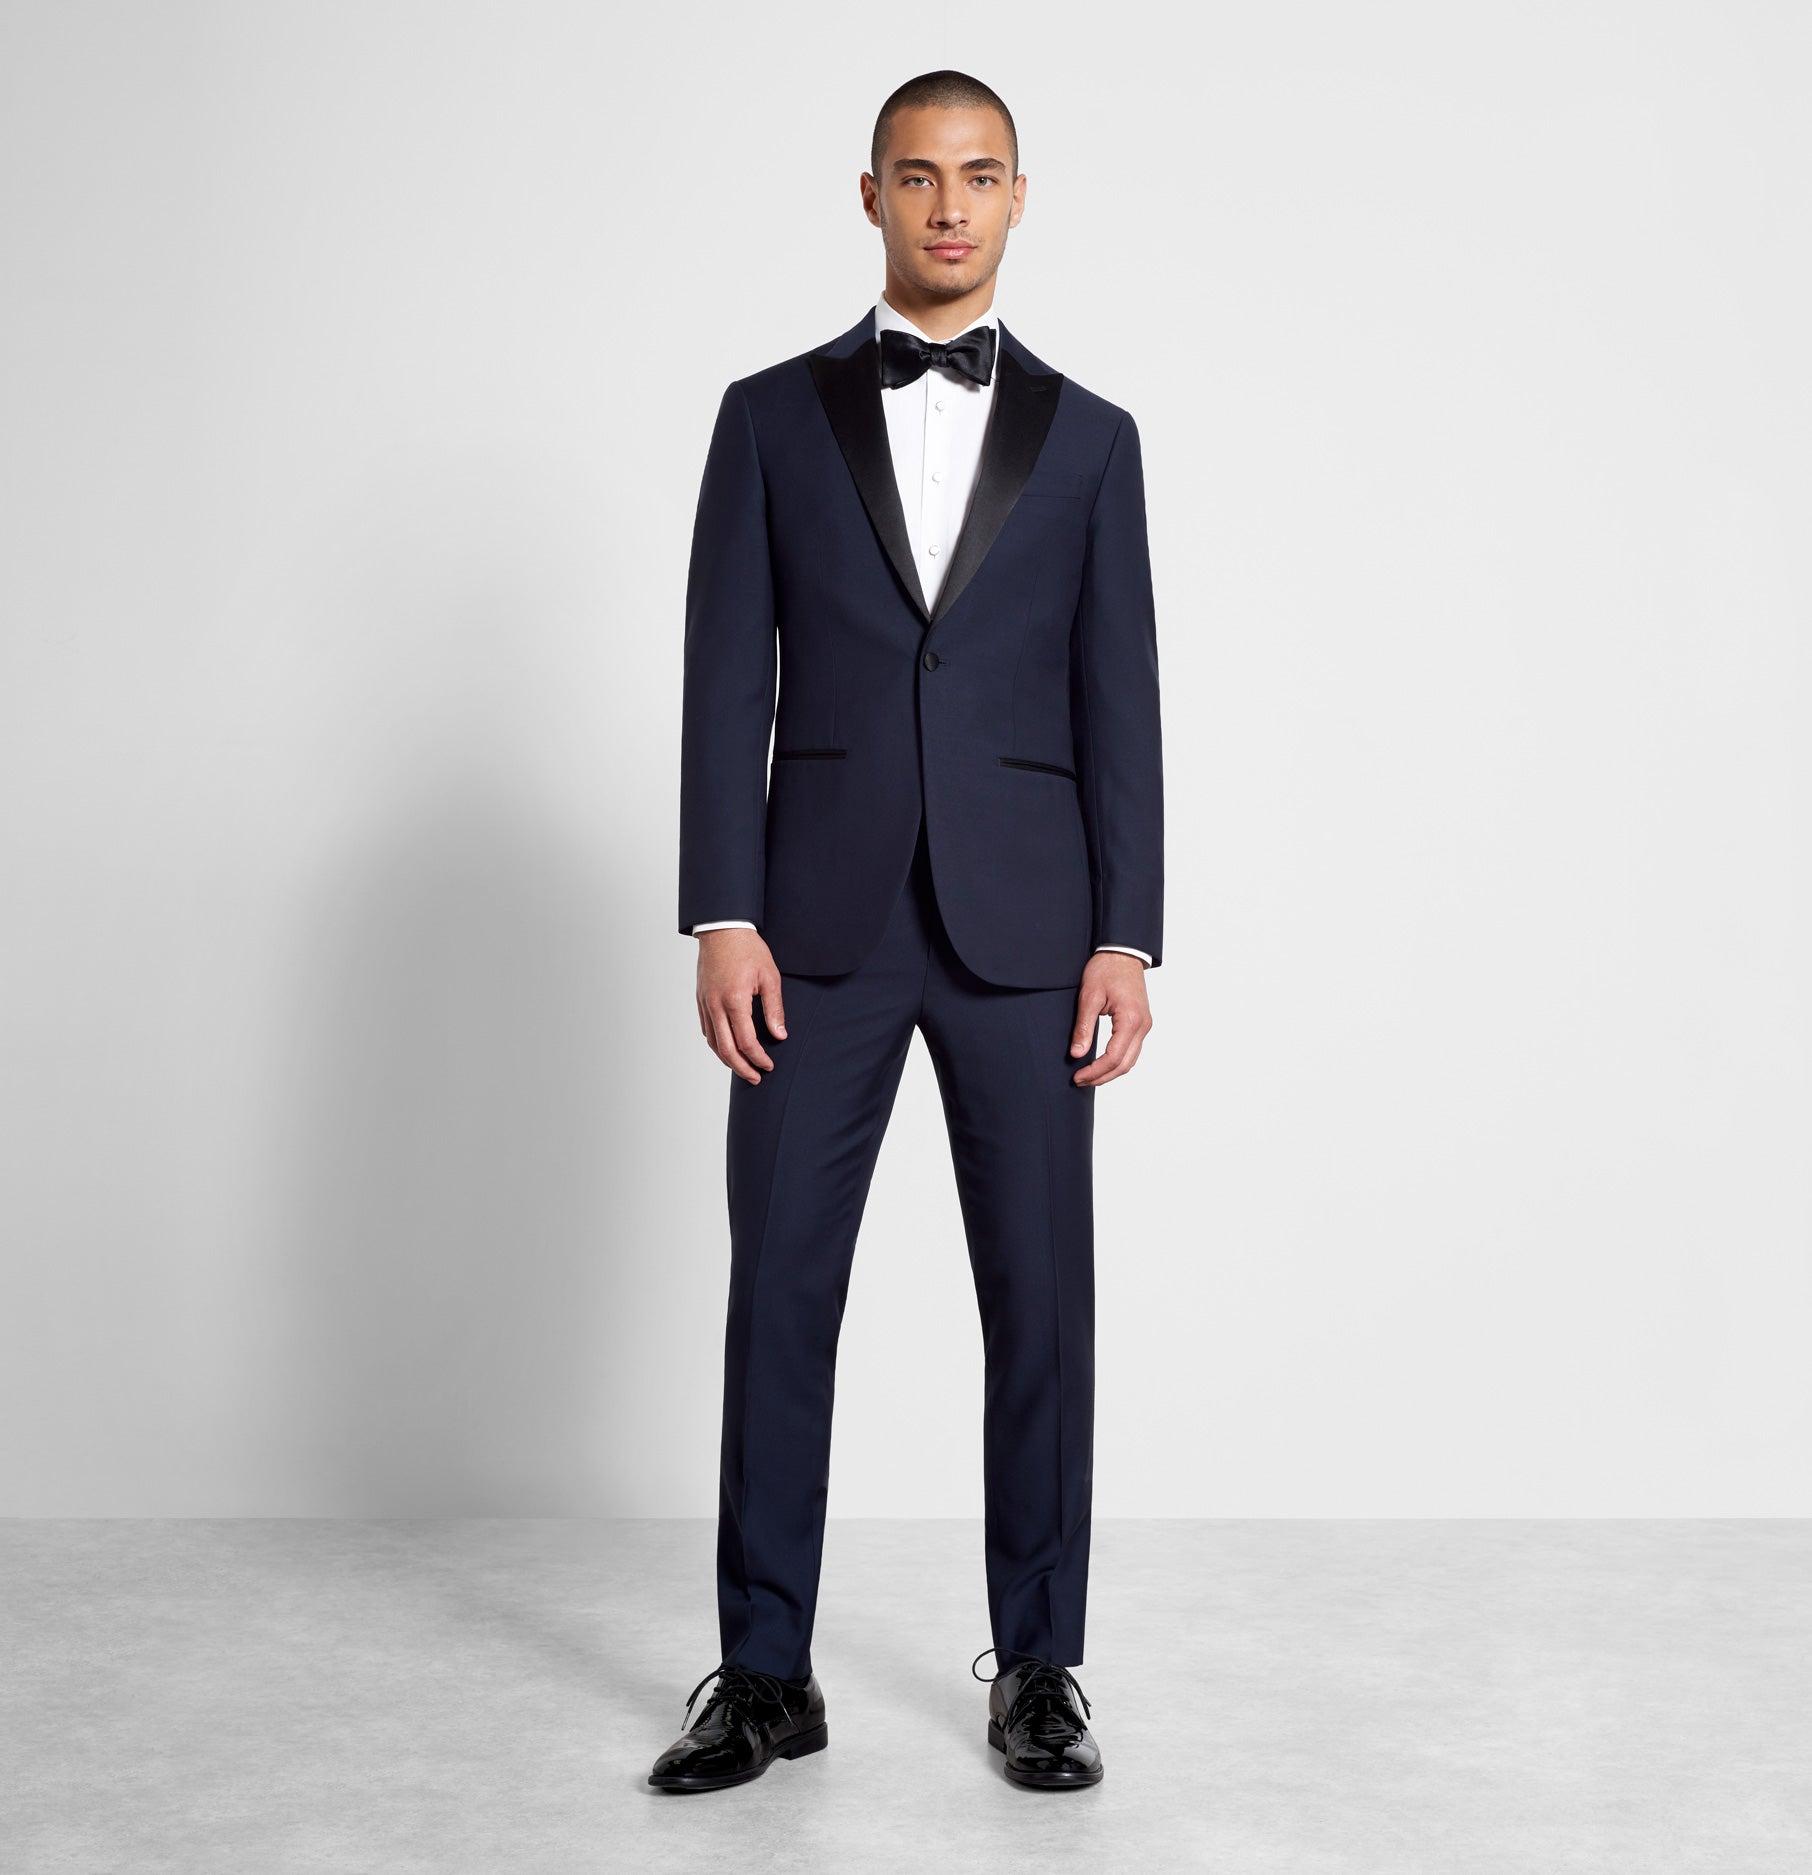 fa5b5b39e2 Suit & Tuxedo Rentals | The Black Tux